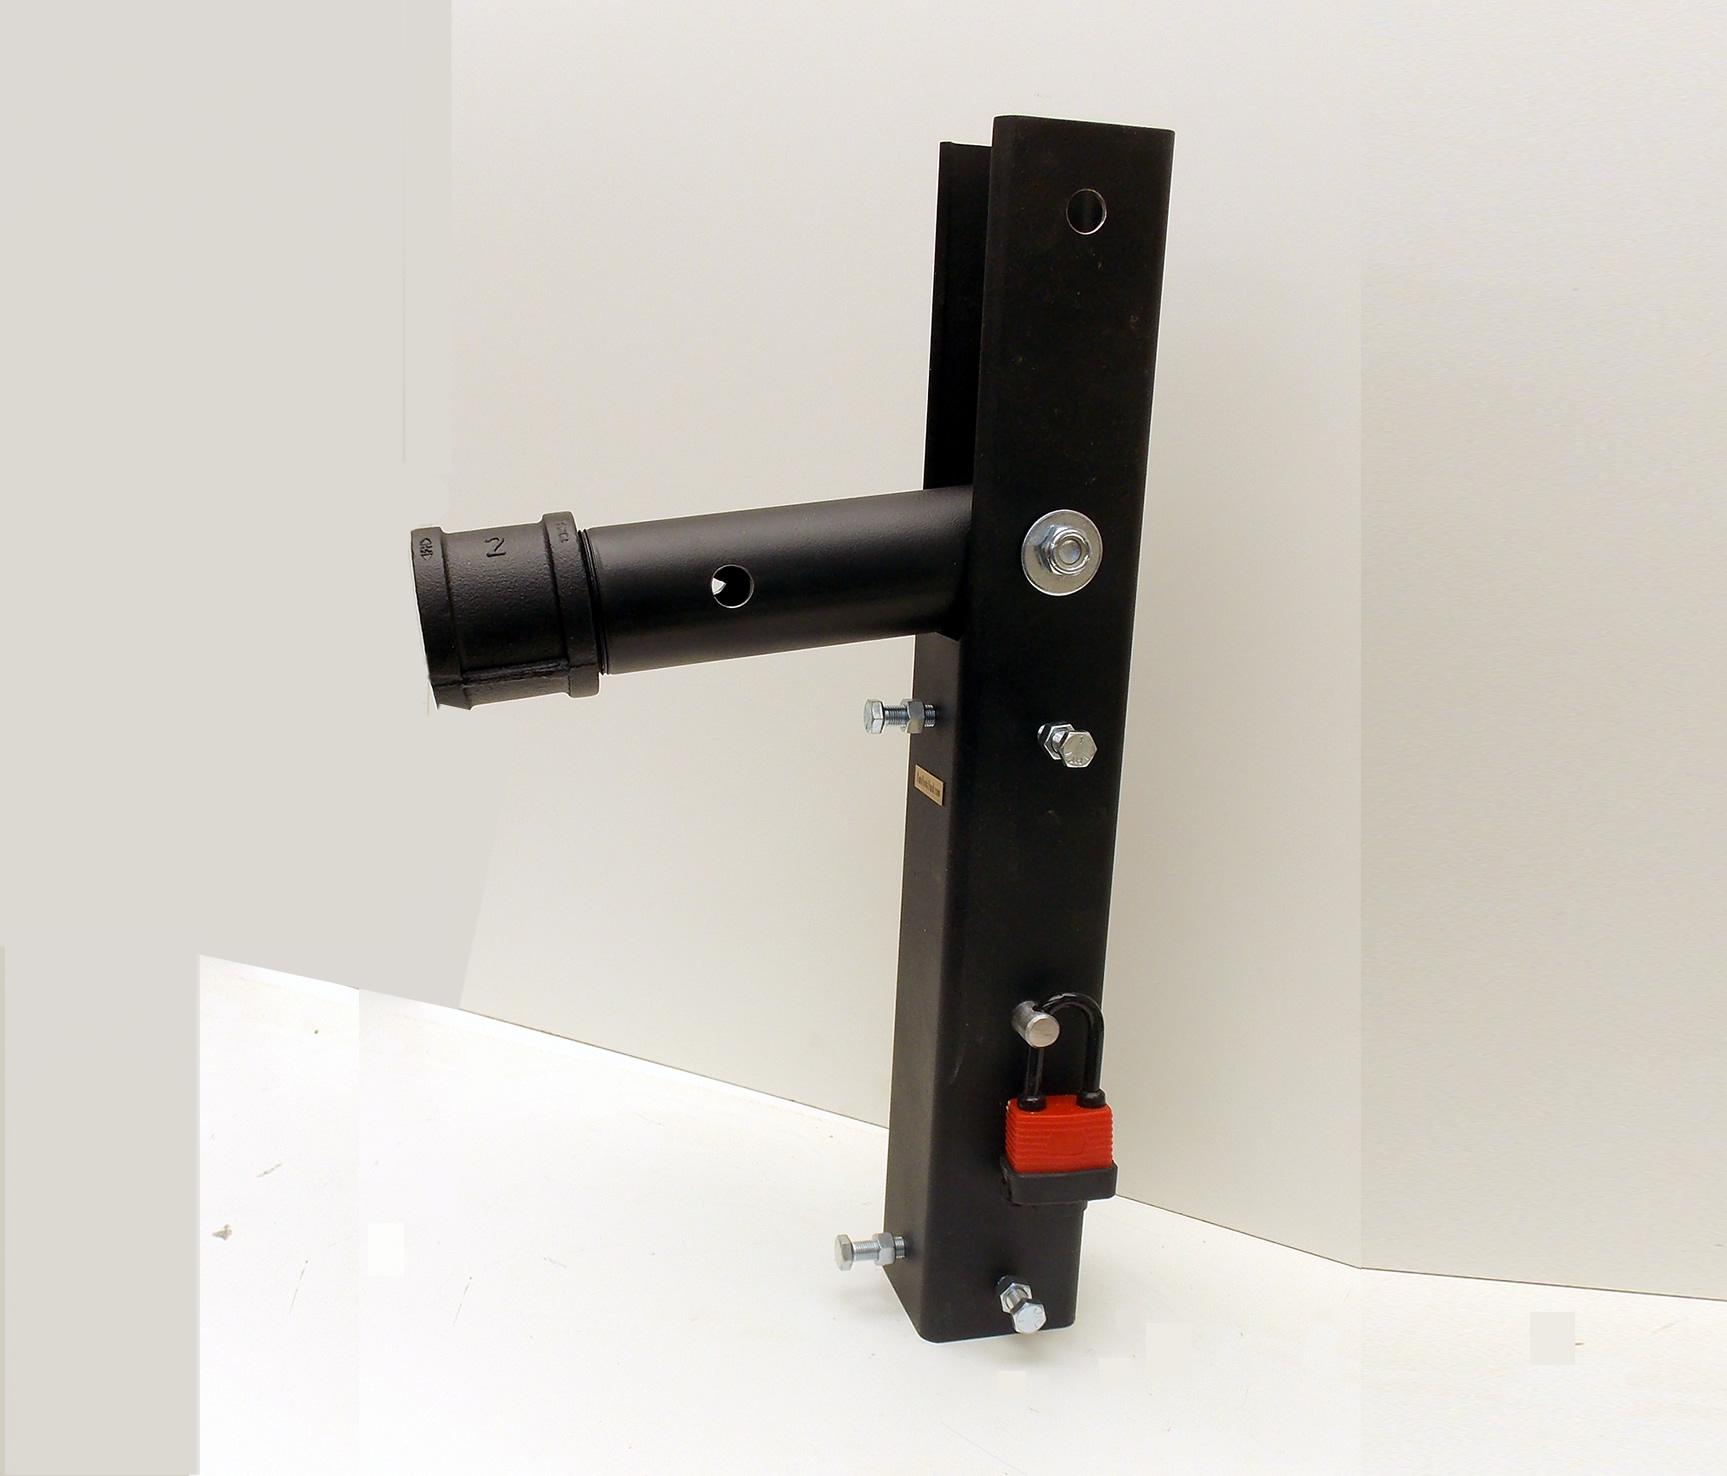 Secure E-Z Up Swivel Mounting Bracket for a Steel Pole Mounted Bat House